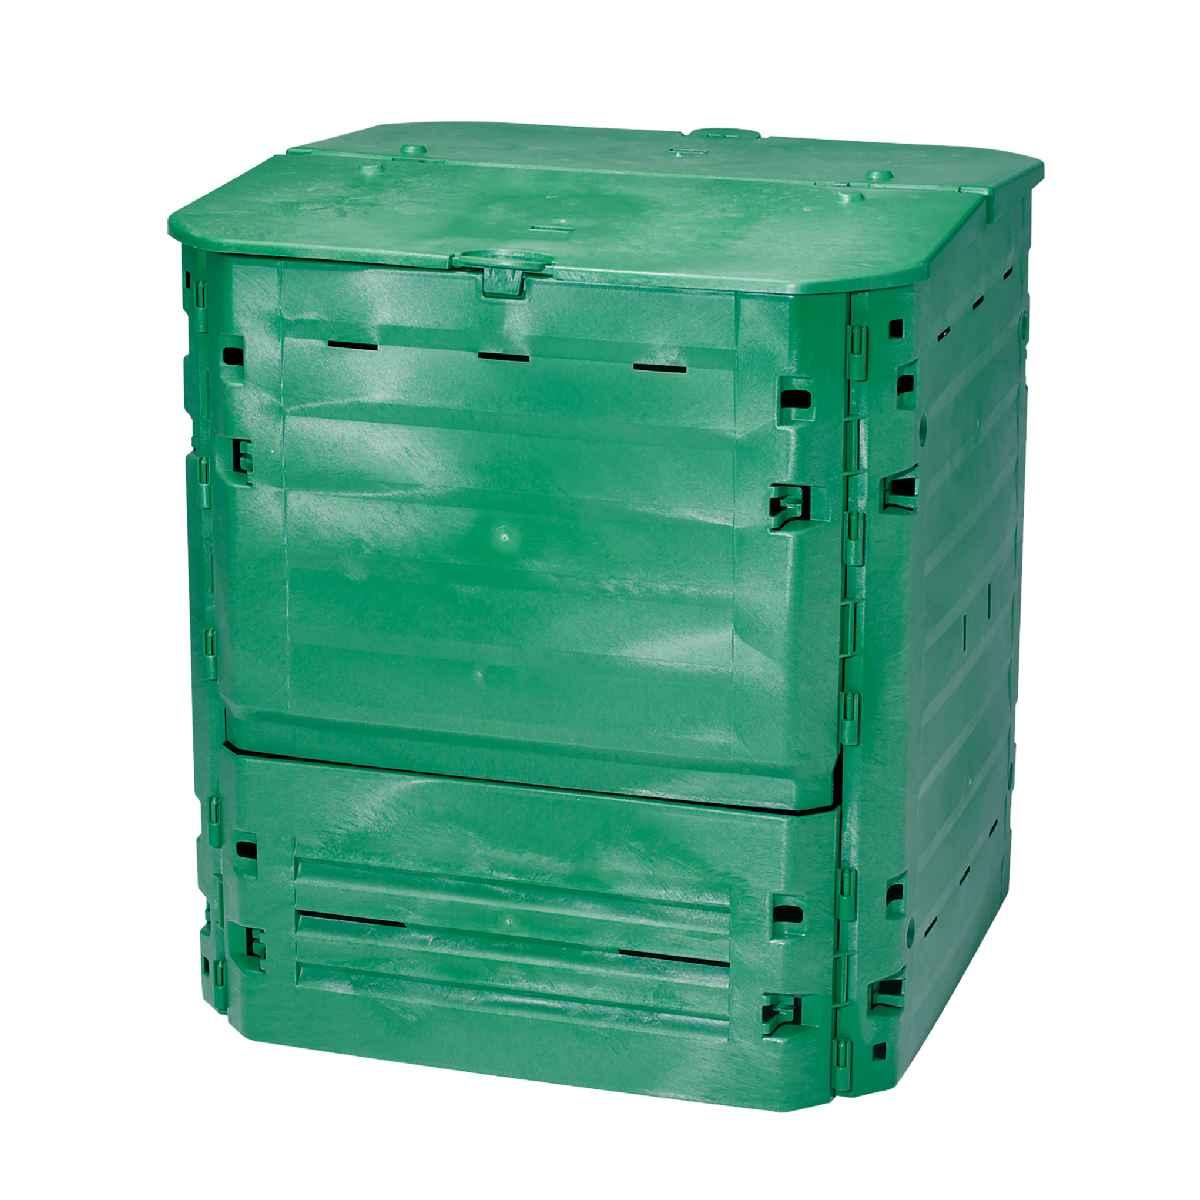 Garantia Thermo King Composter 600L